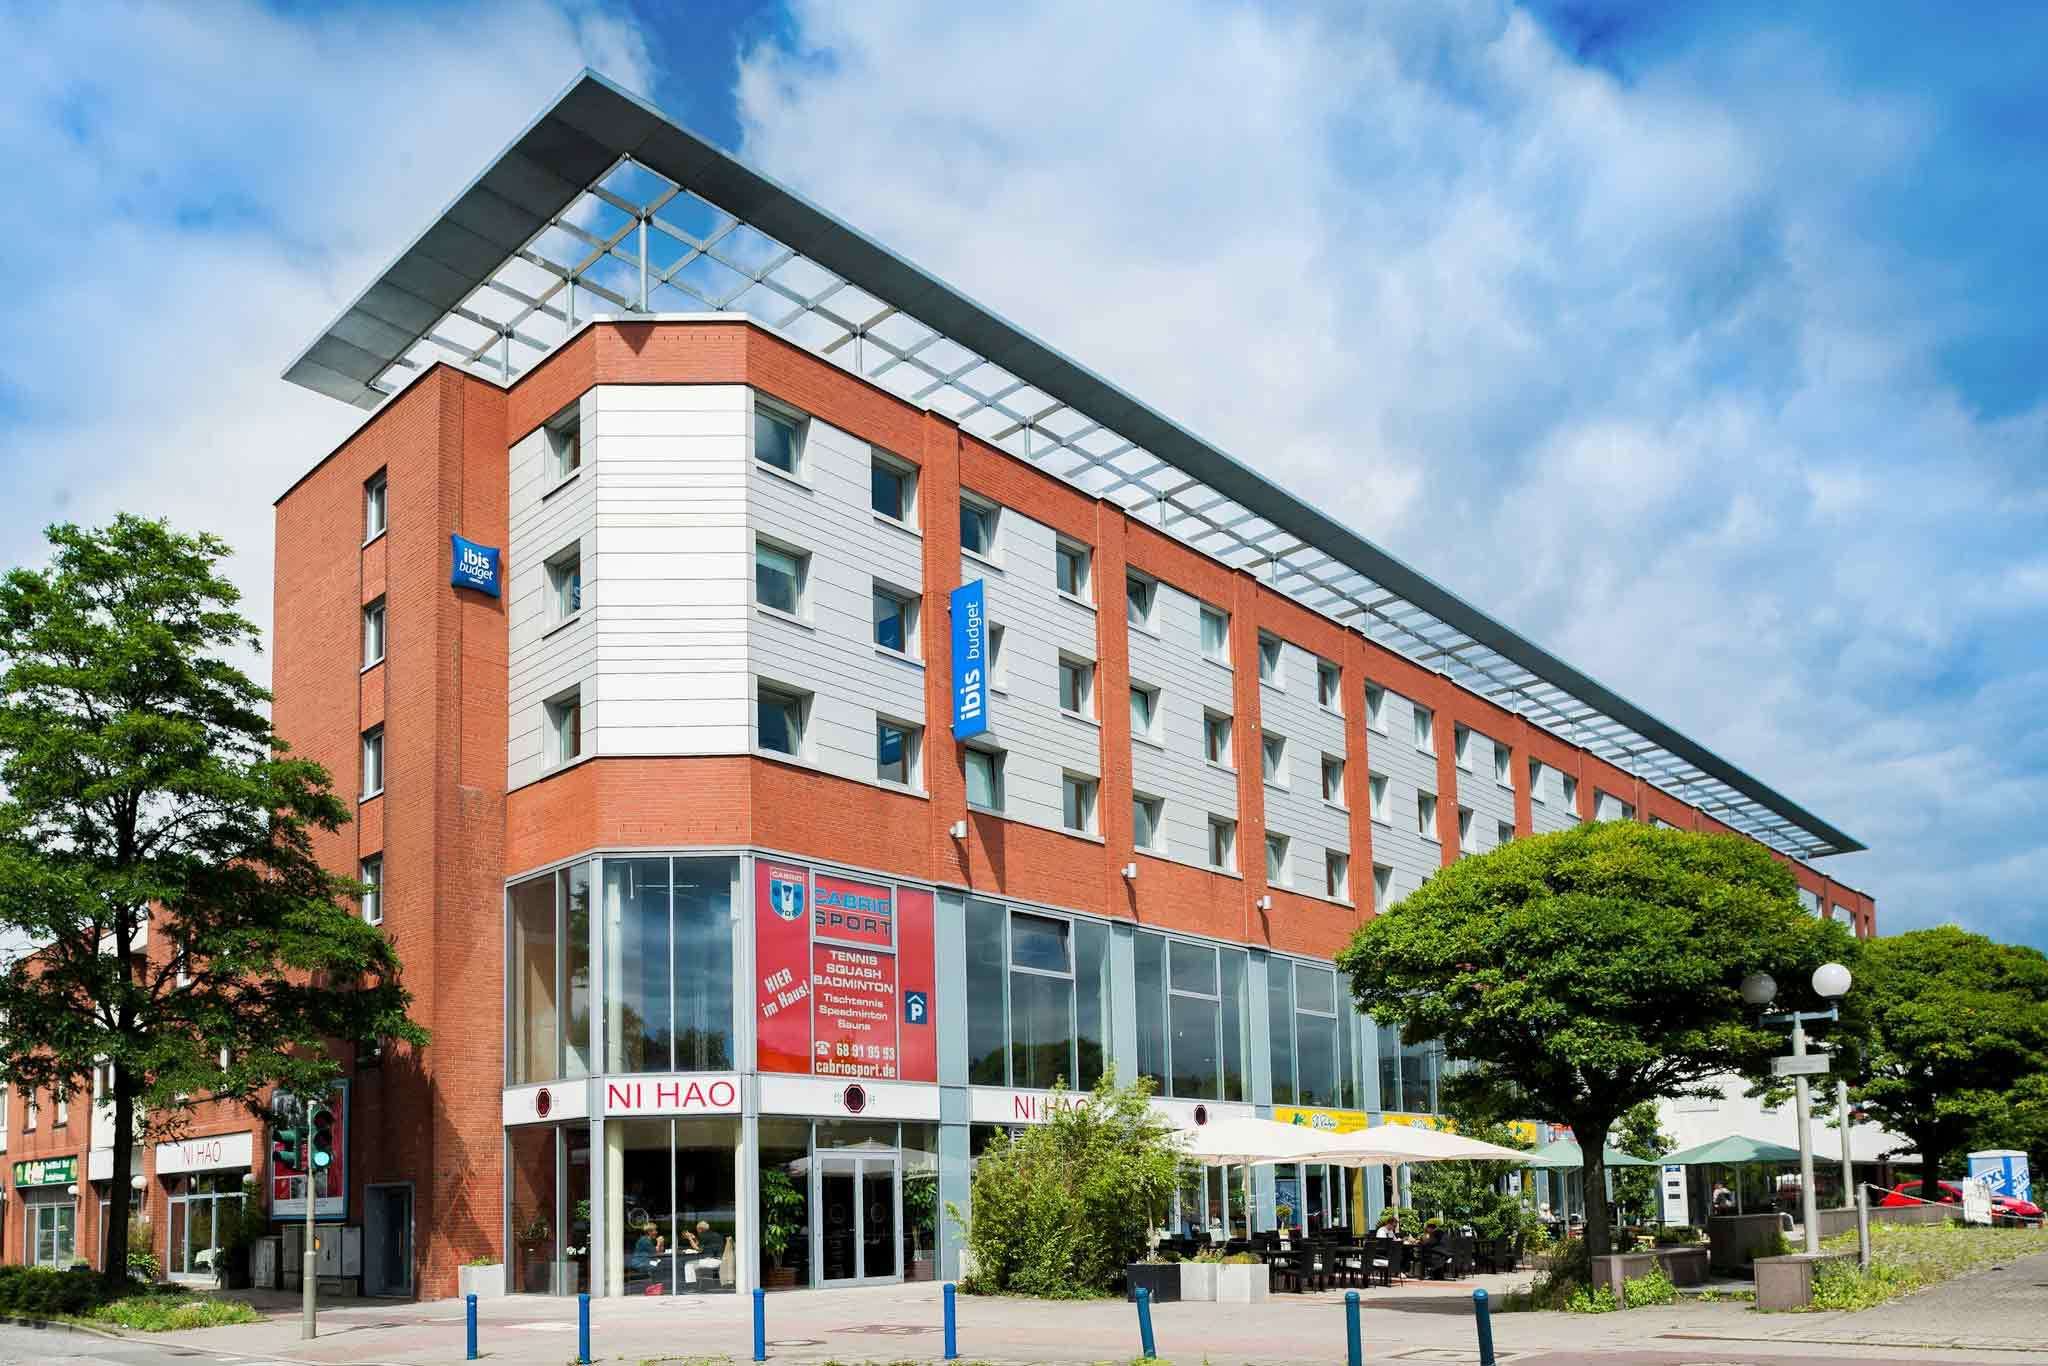 فندق - إيبيس بدجت ibis budget هامبورغ سيتي أوست